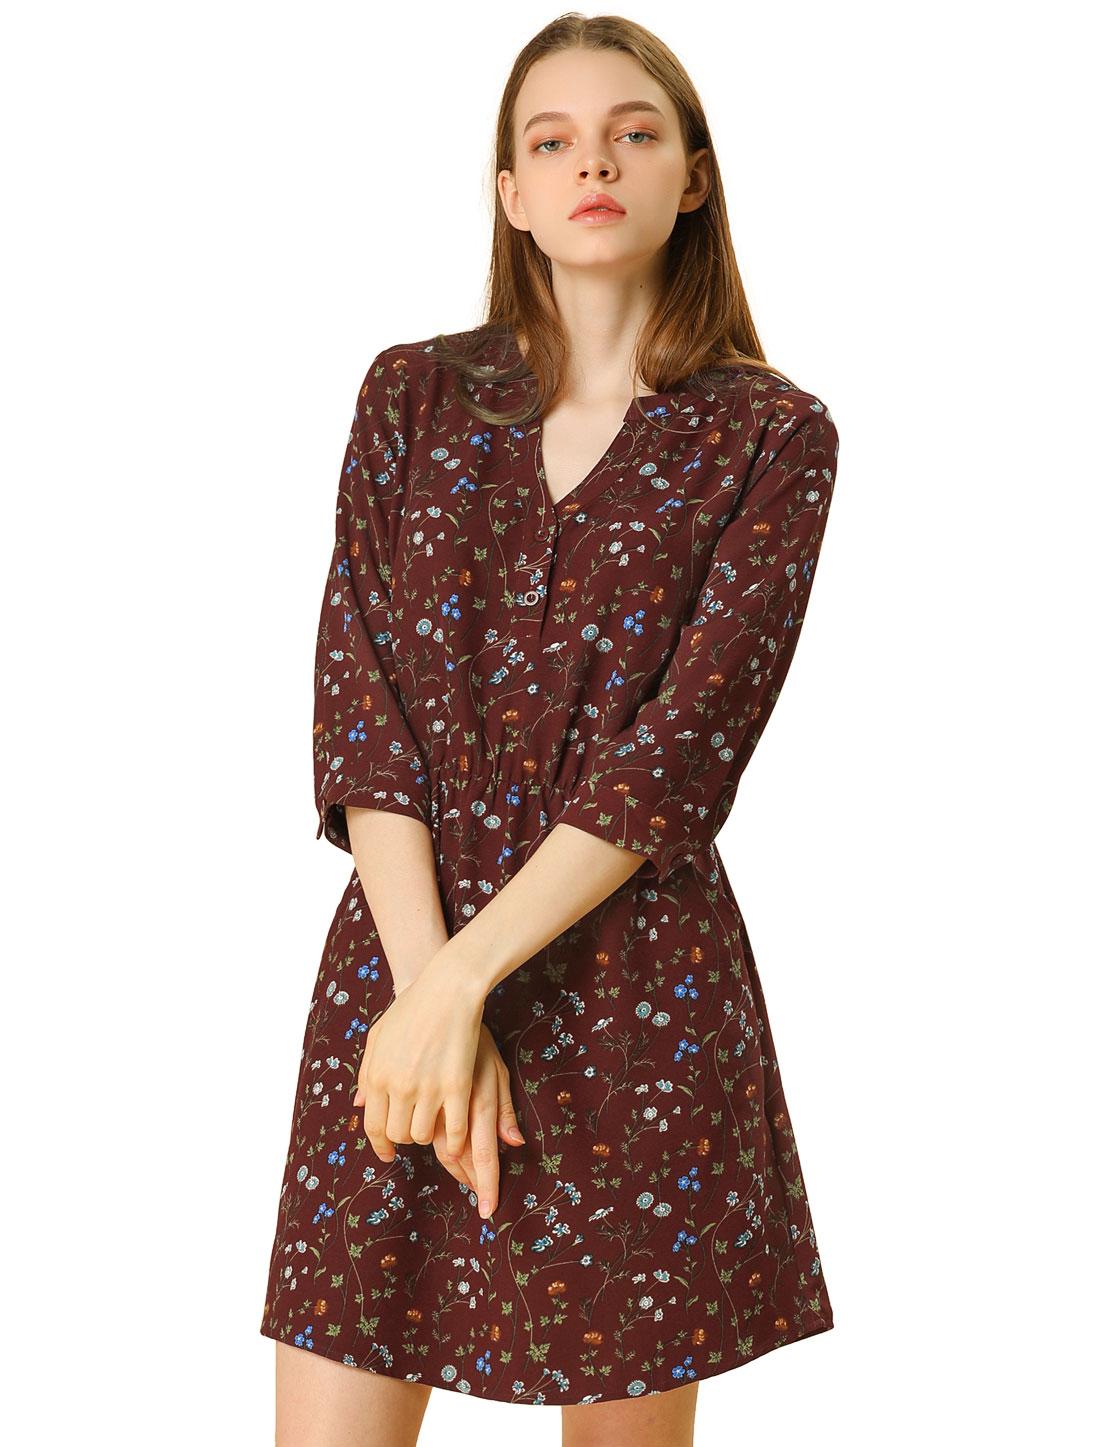 Allegra K Women Button Down V Neck Side Pockets Floral Dress Purplish Red S